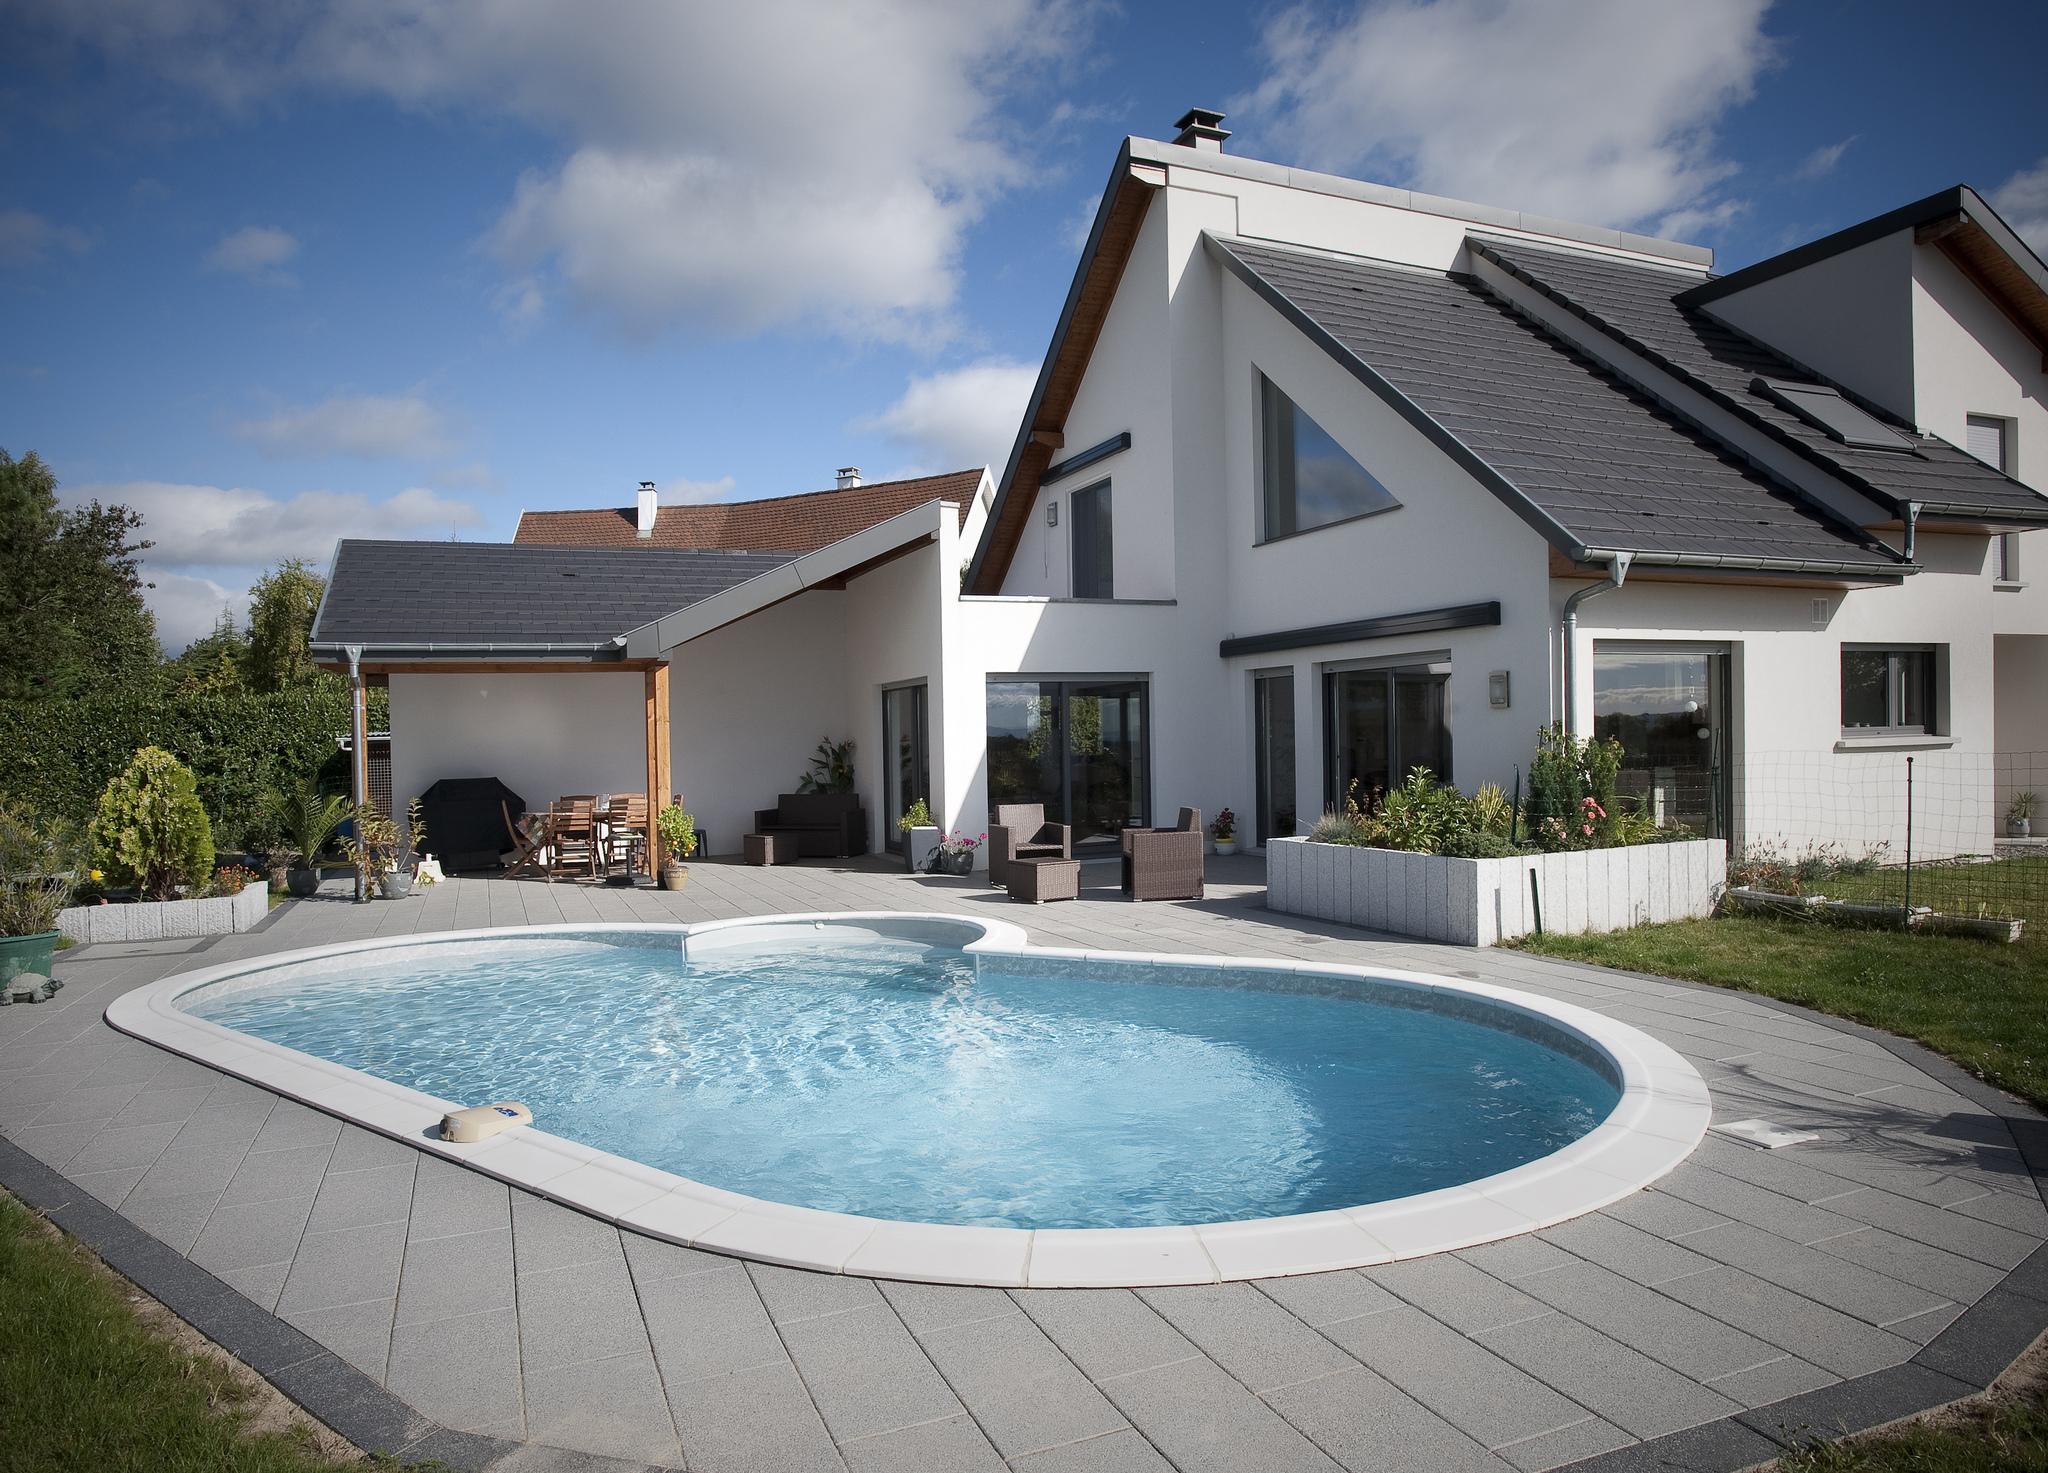 comparatif les solutions pour fermer sa piscine culture jardin. Black Bedroom Furniture Sets. Home Design Ideas